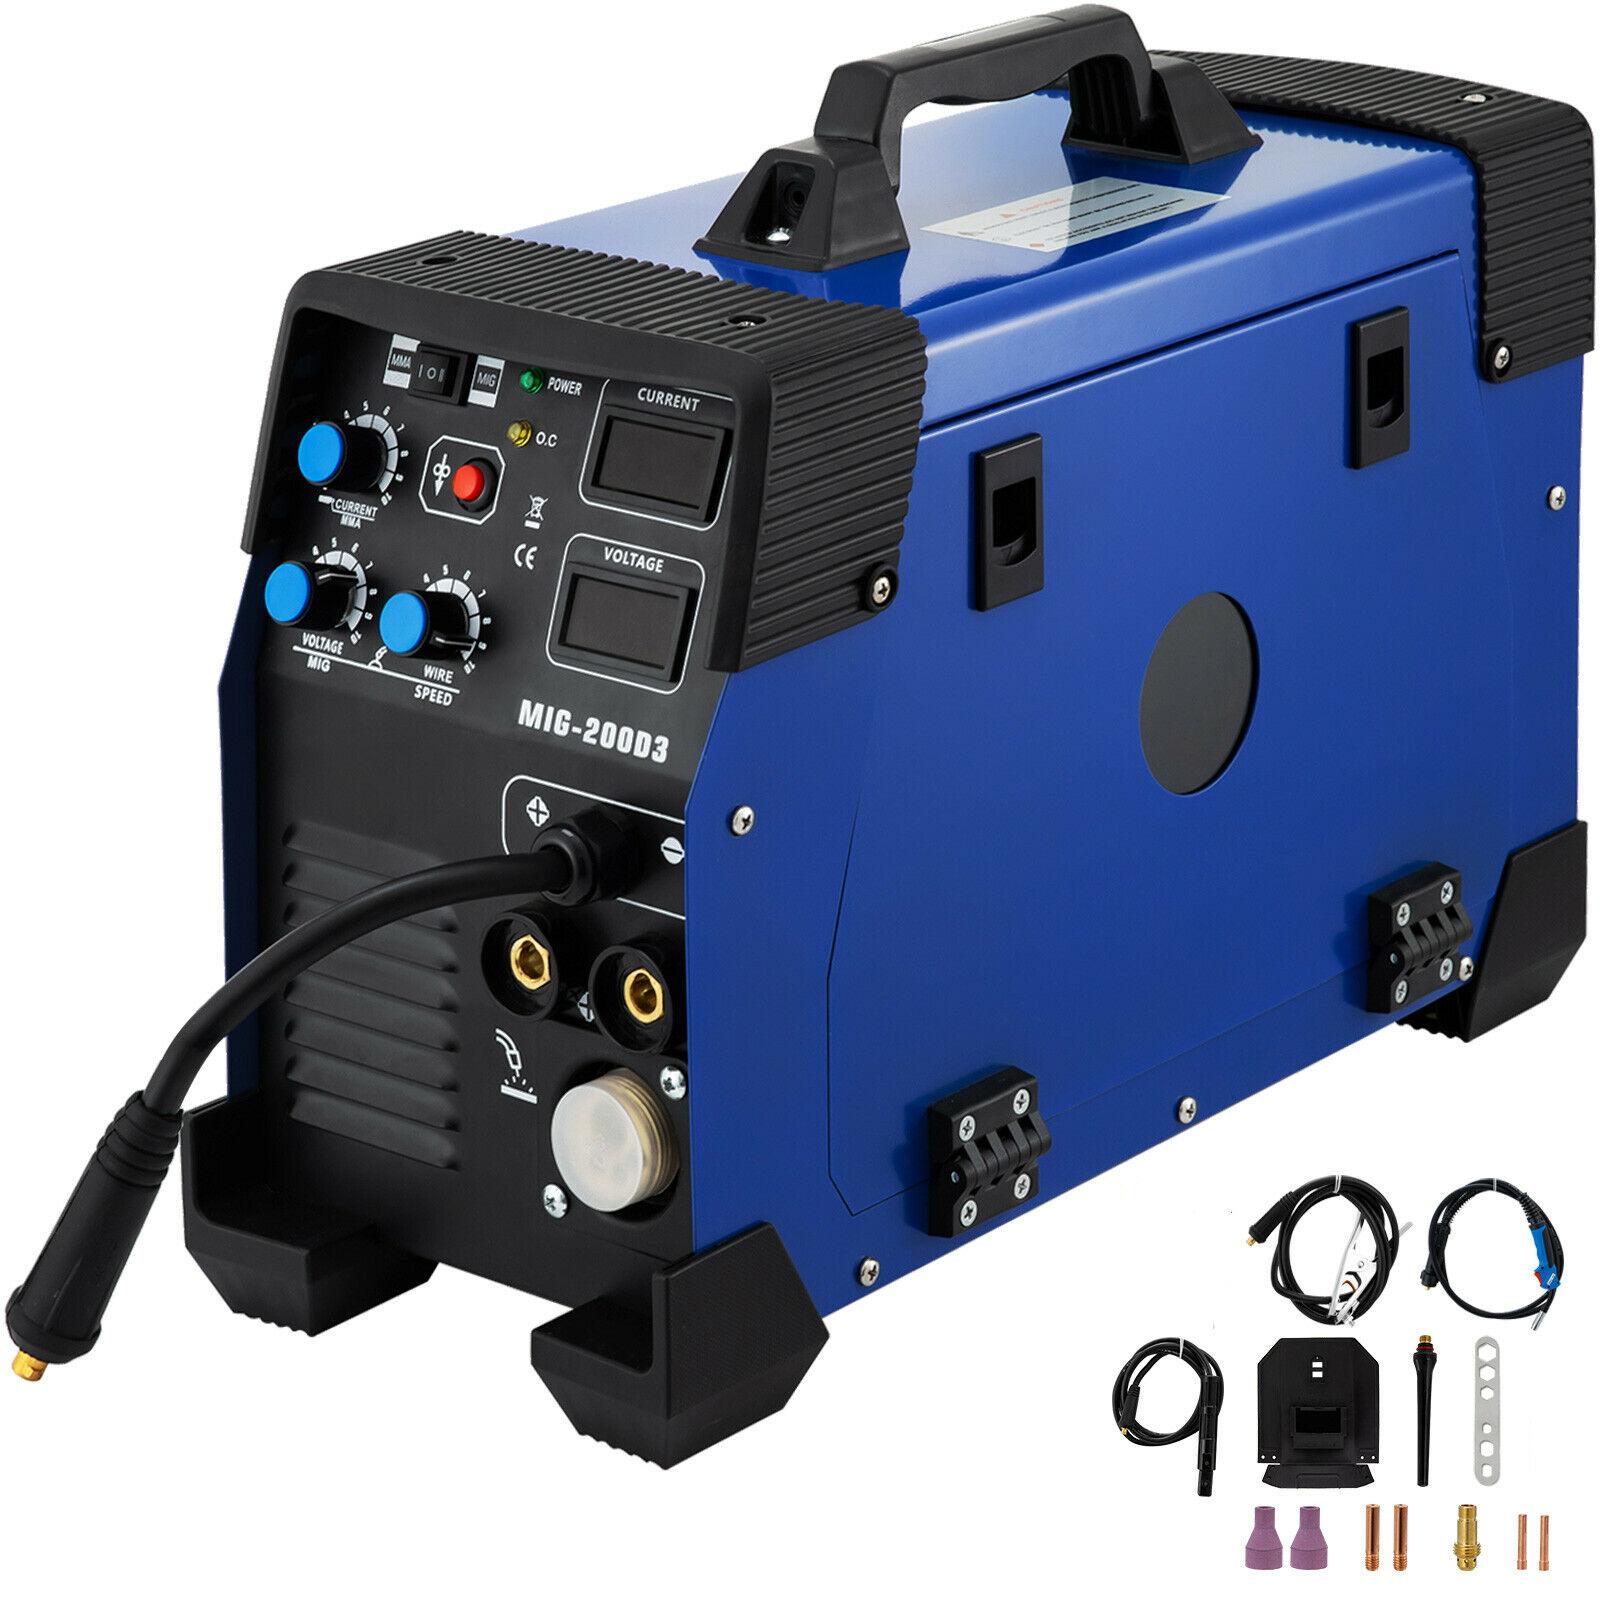 TIG MIG инвертор сварочный аппарат MAG MMA E-Hand FCAW электрод сварочный аппарат 230V 200A